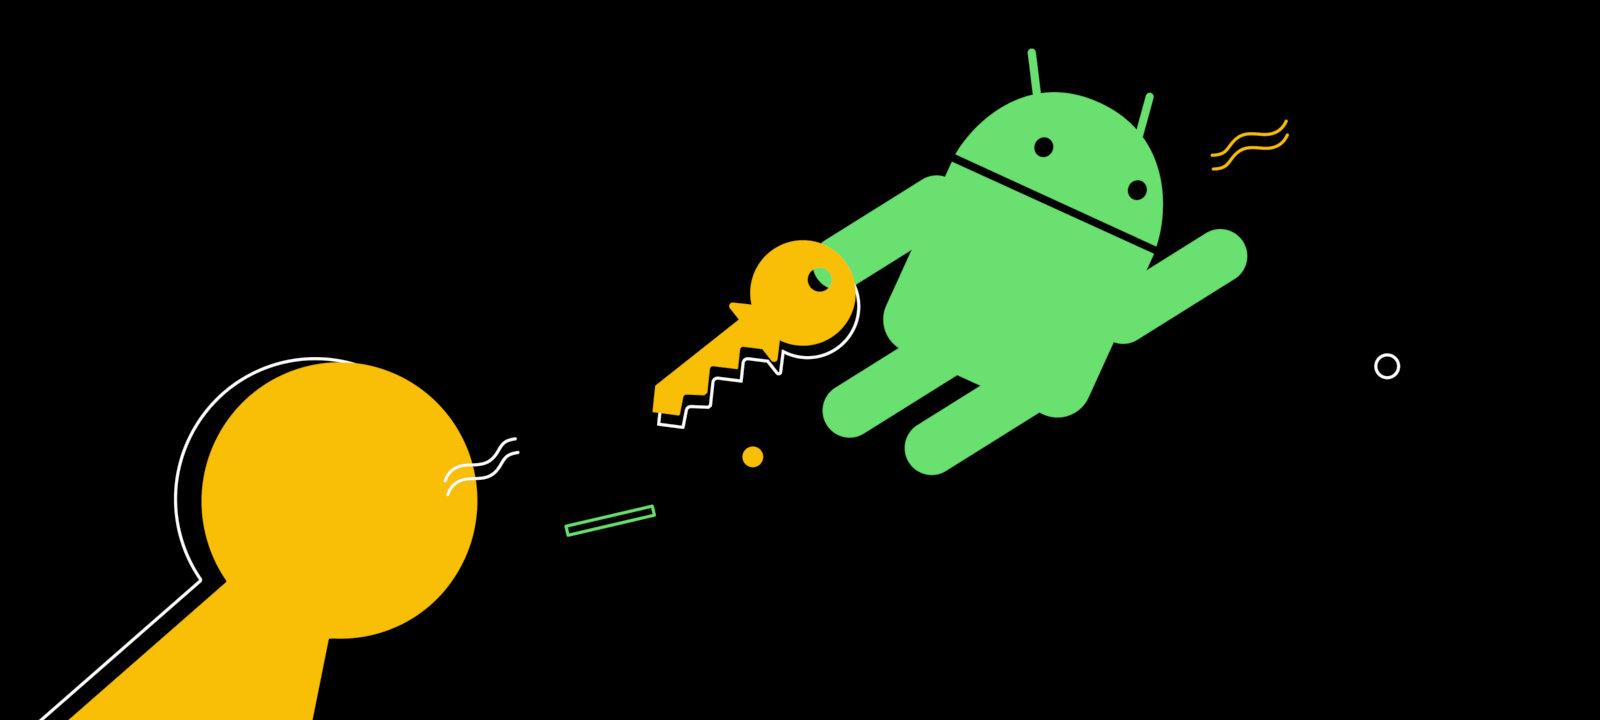 Android: безопасность Android 12 и принцип работы корутин